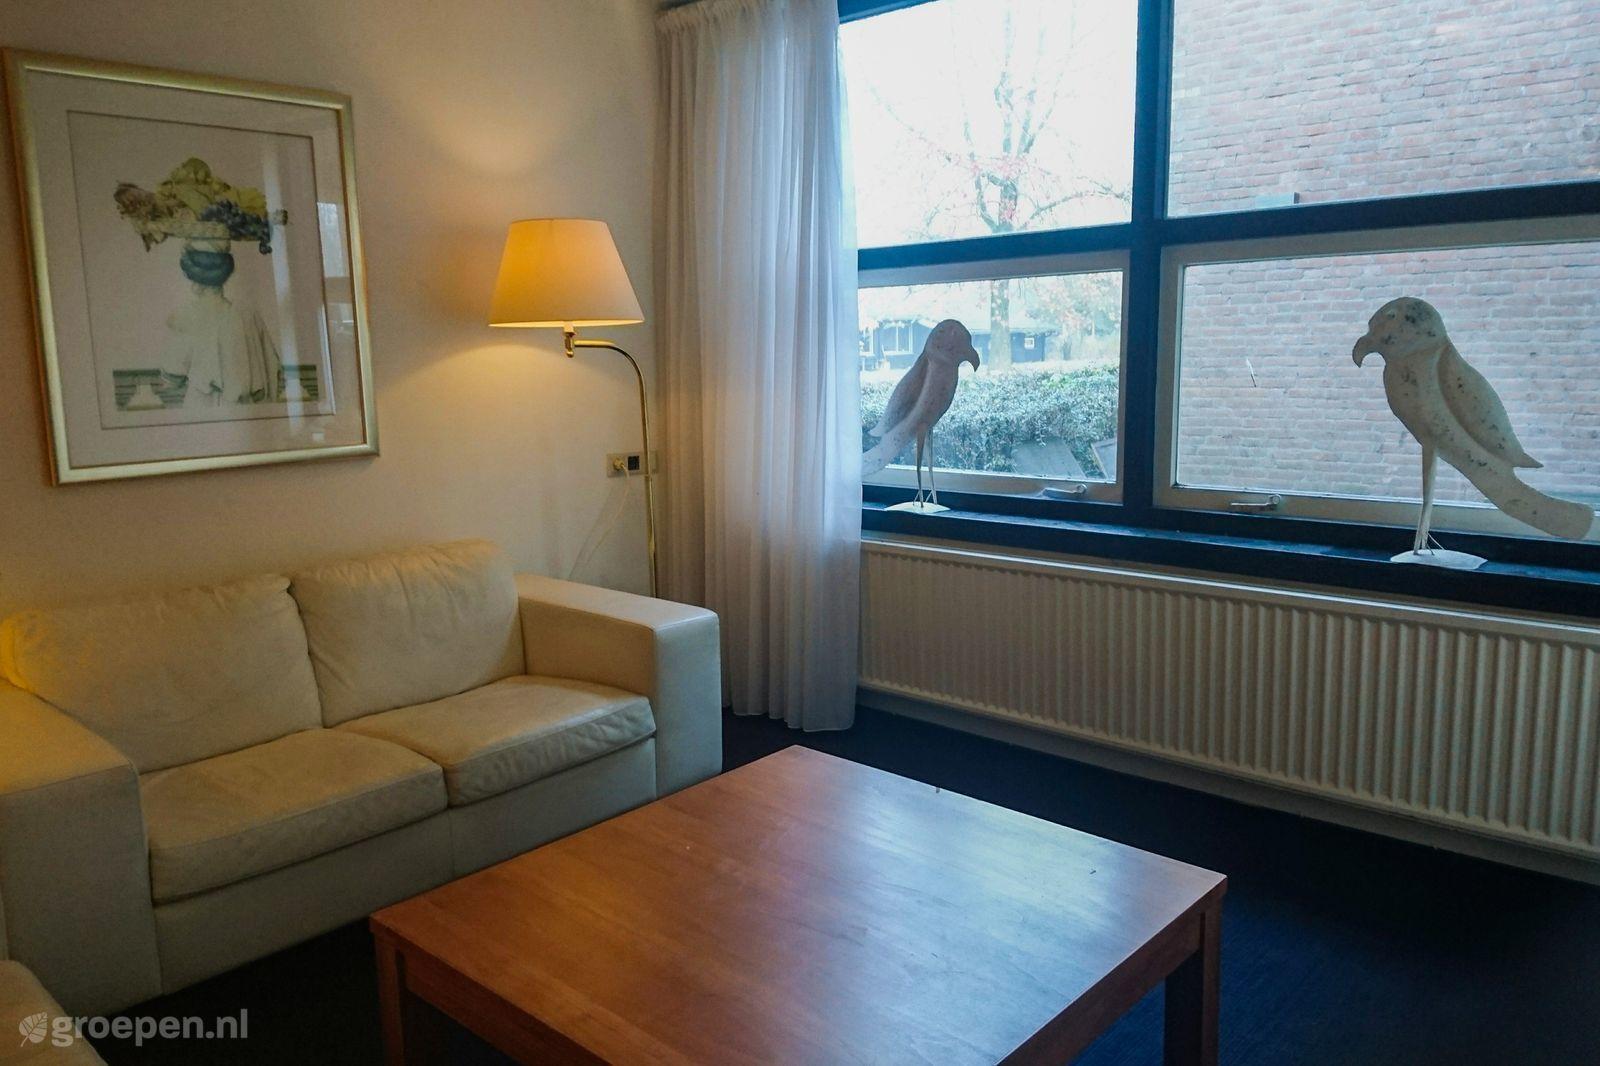 Group accommodation Laag zuthem